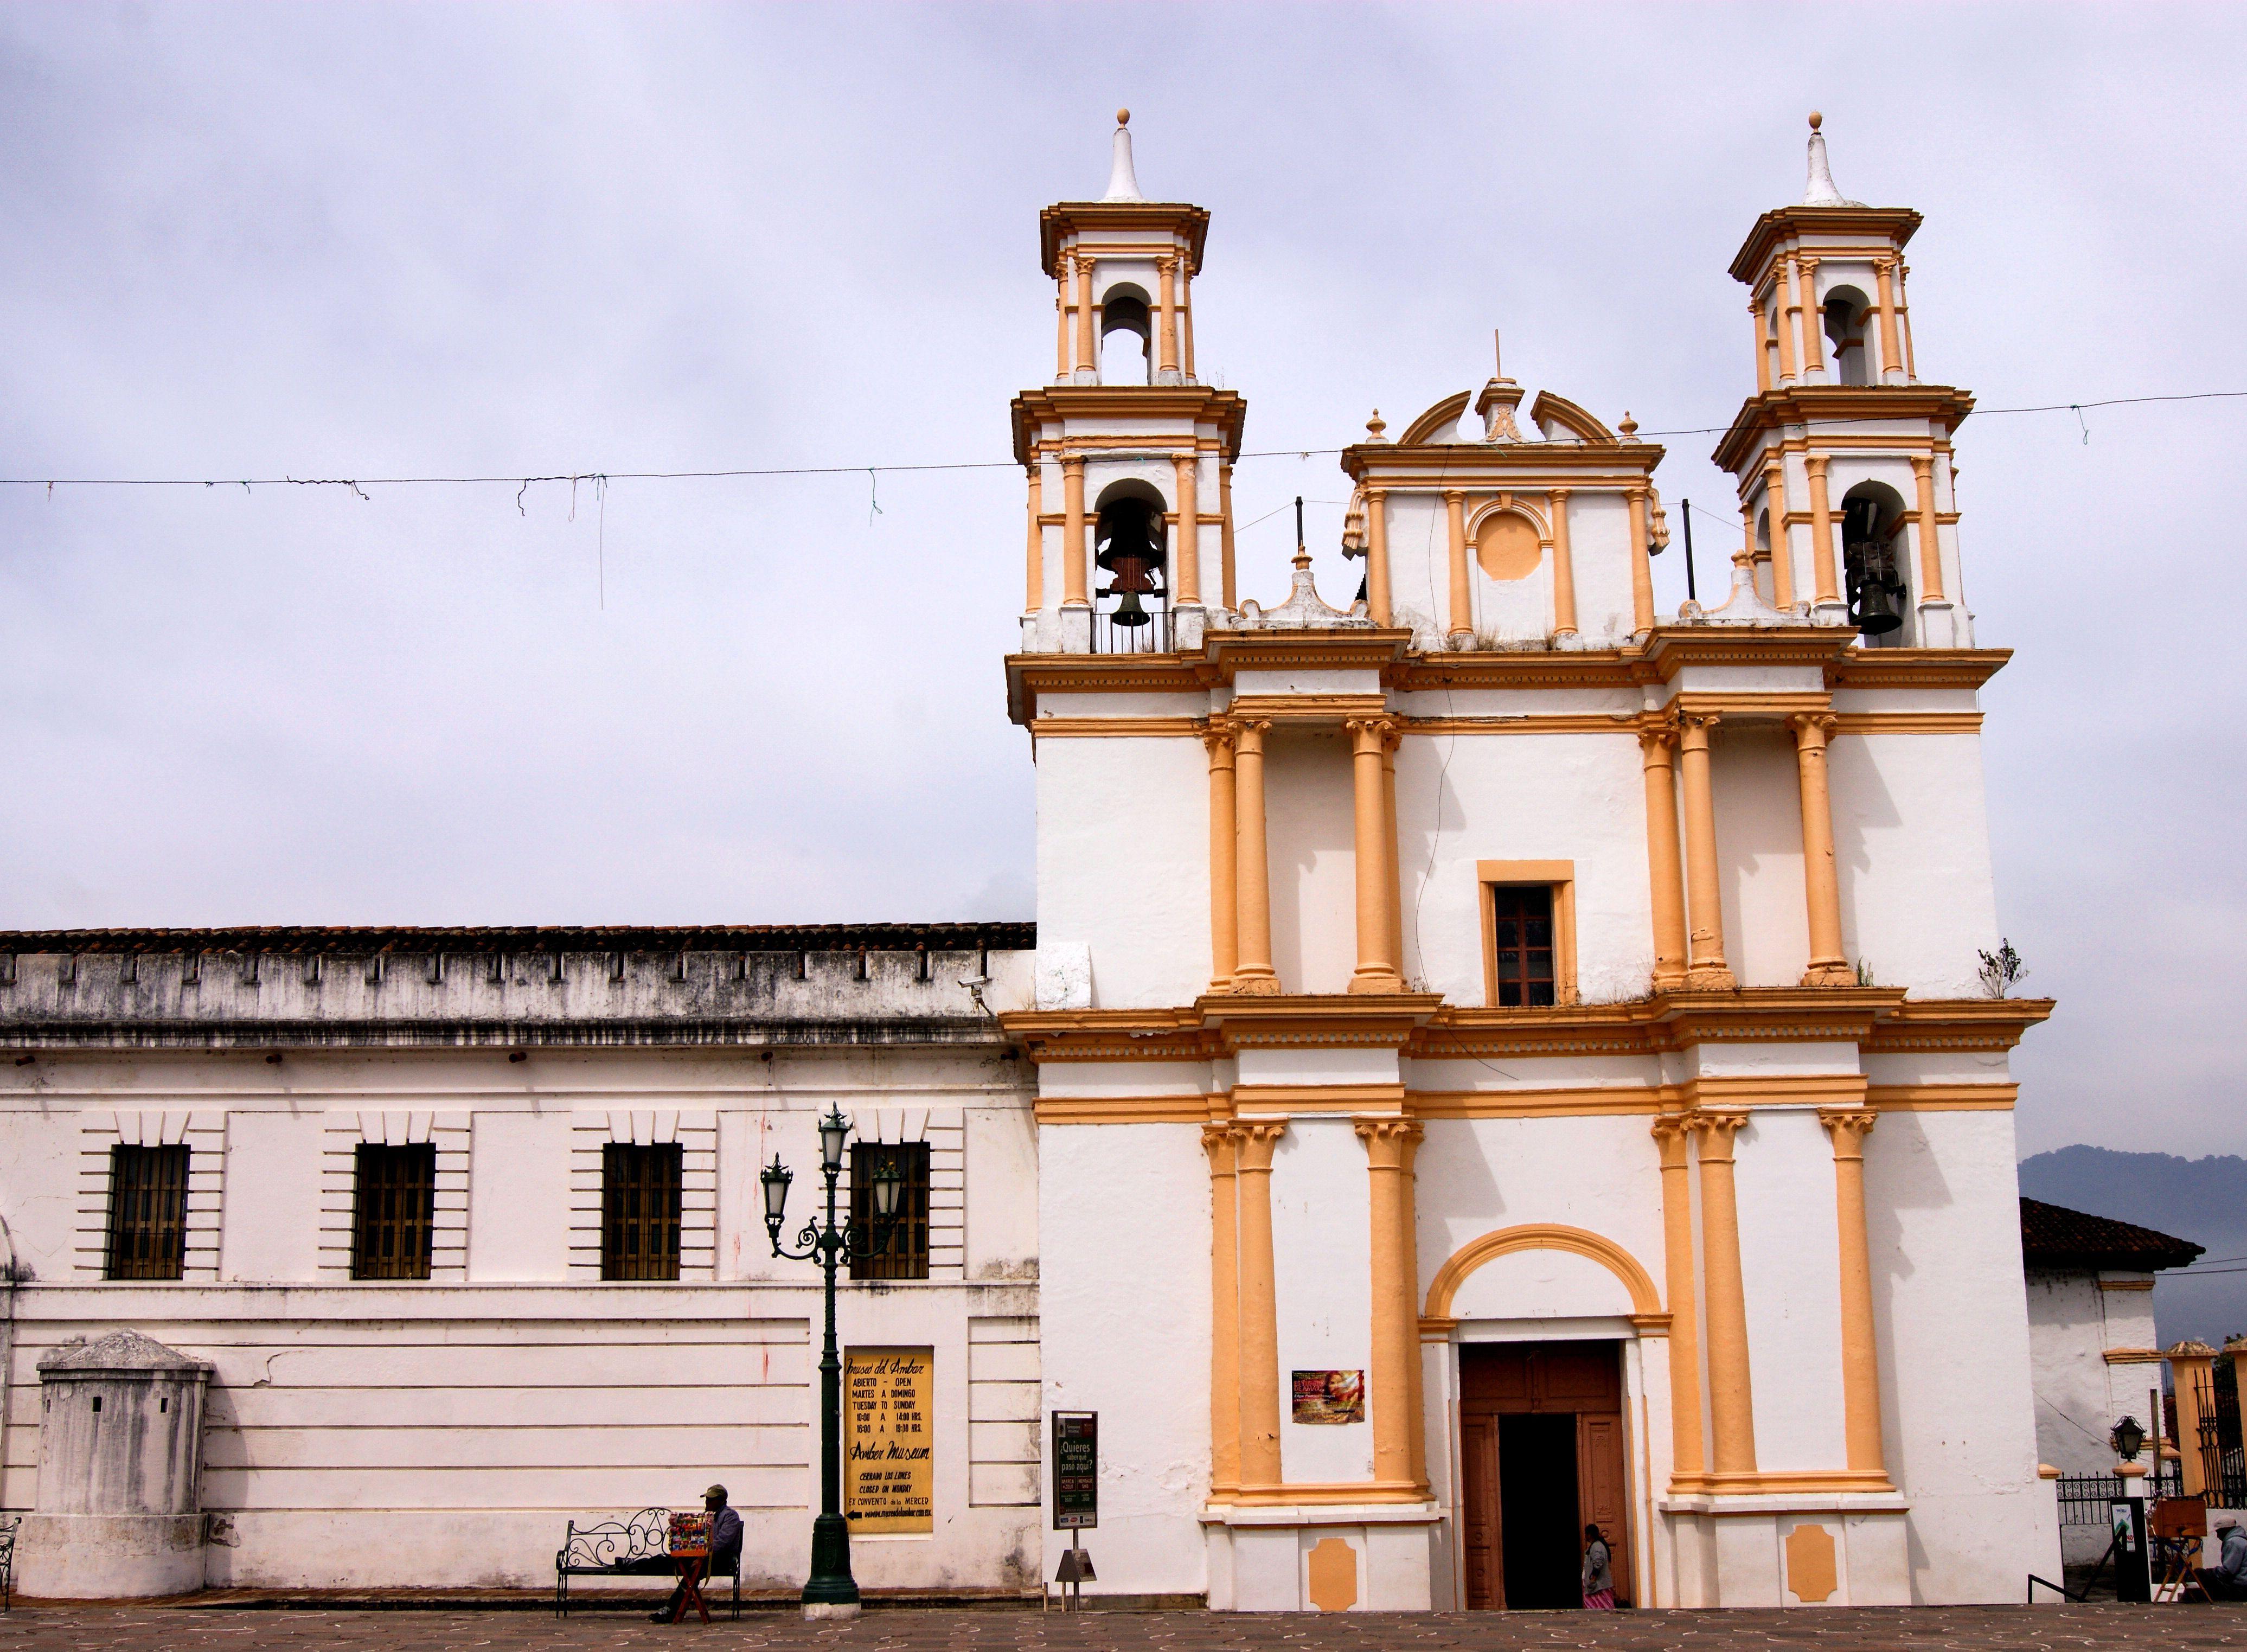 San Cristobal de Las Casas Chapas Mexico my favorite